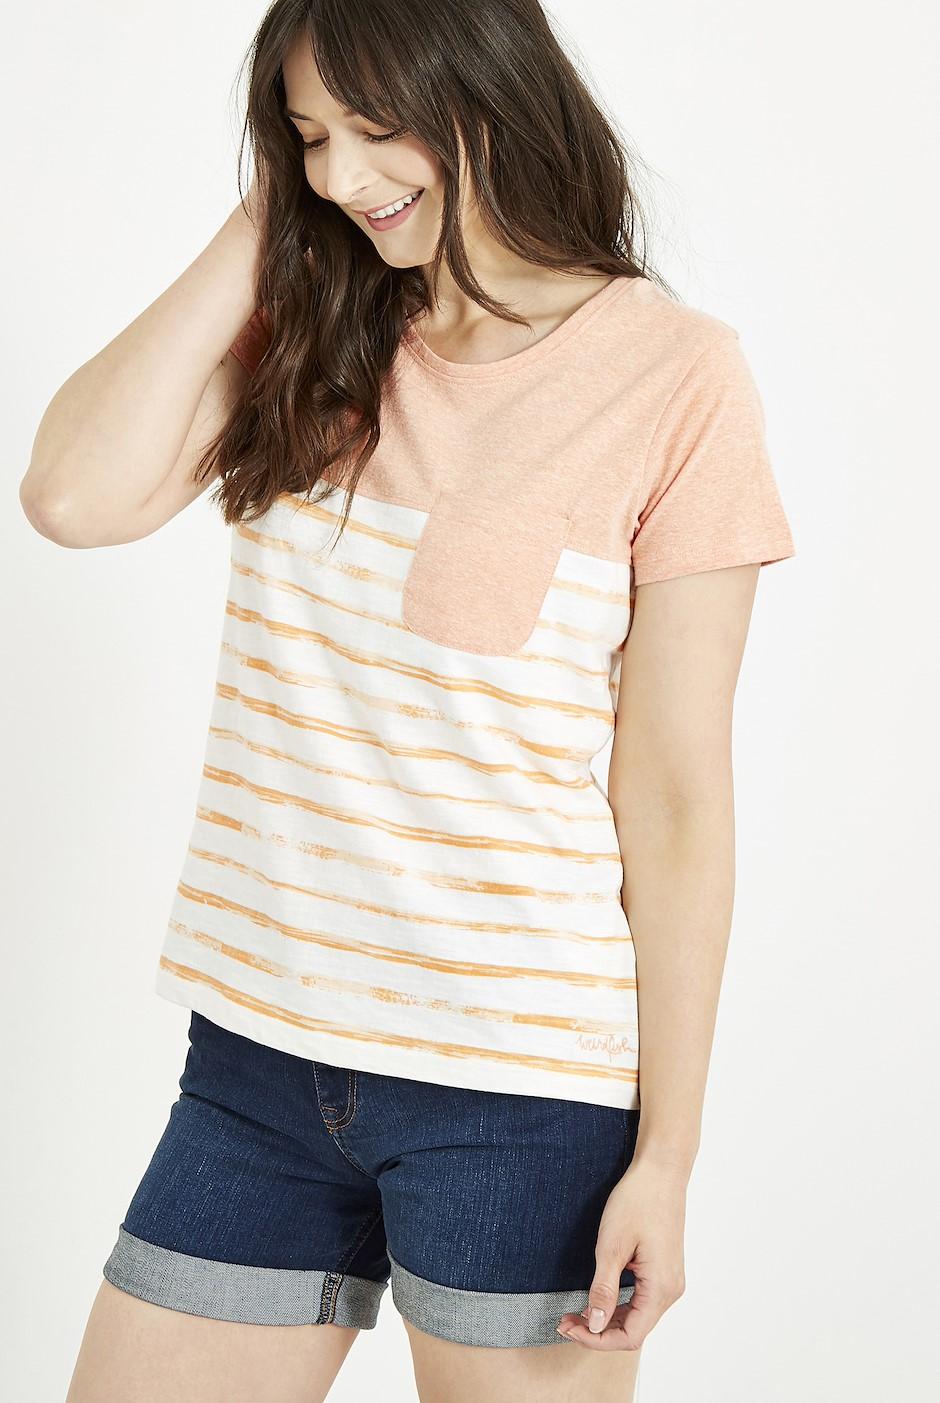 Paros Pocket T-Shirt Shell